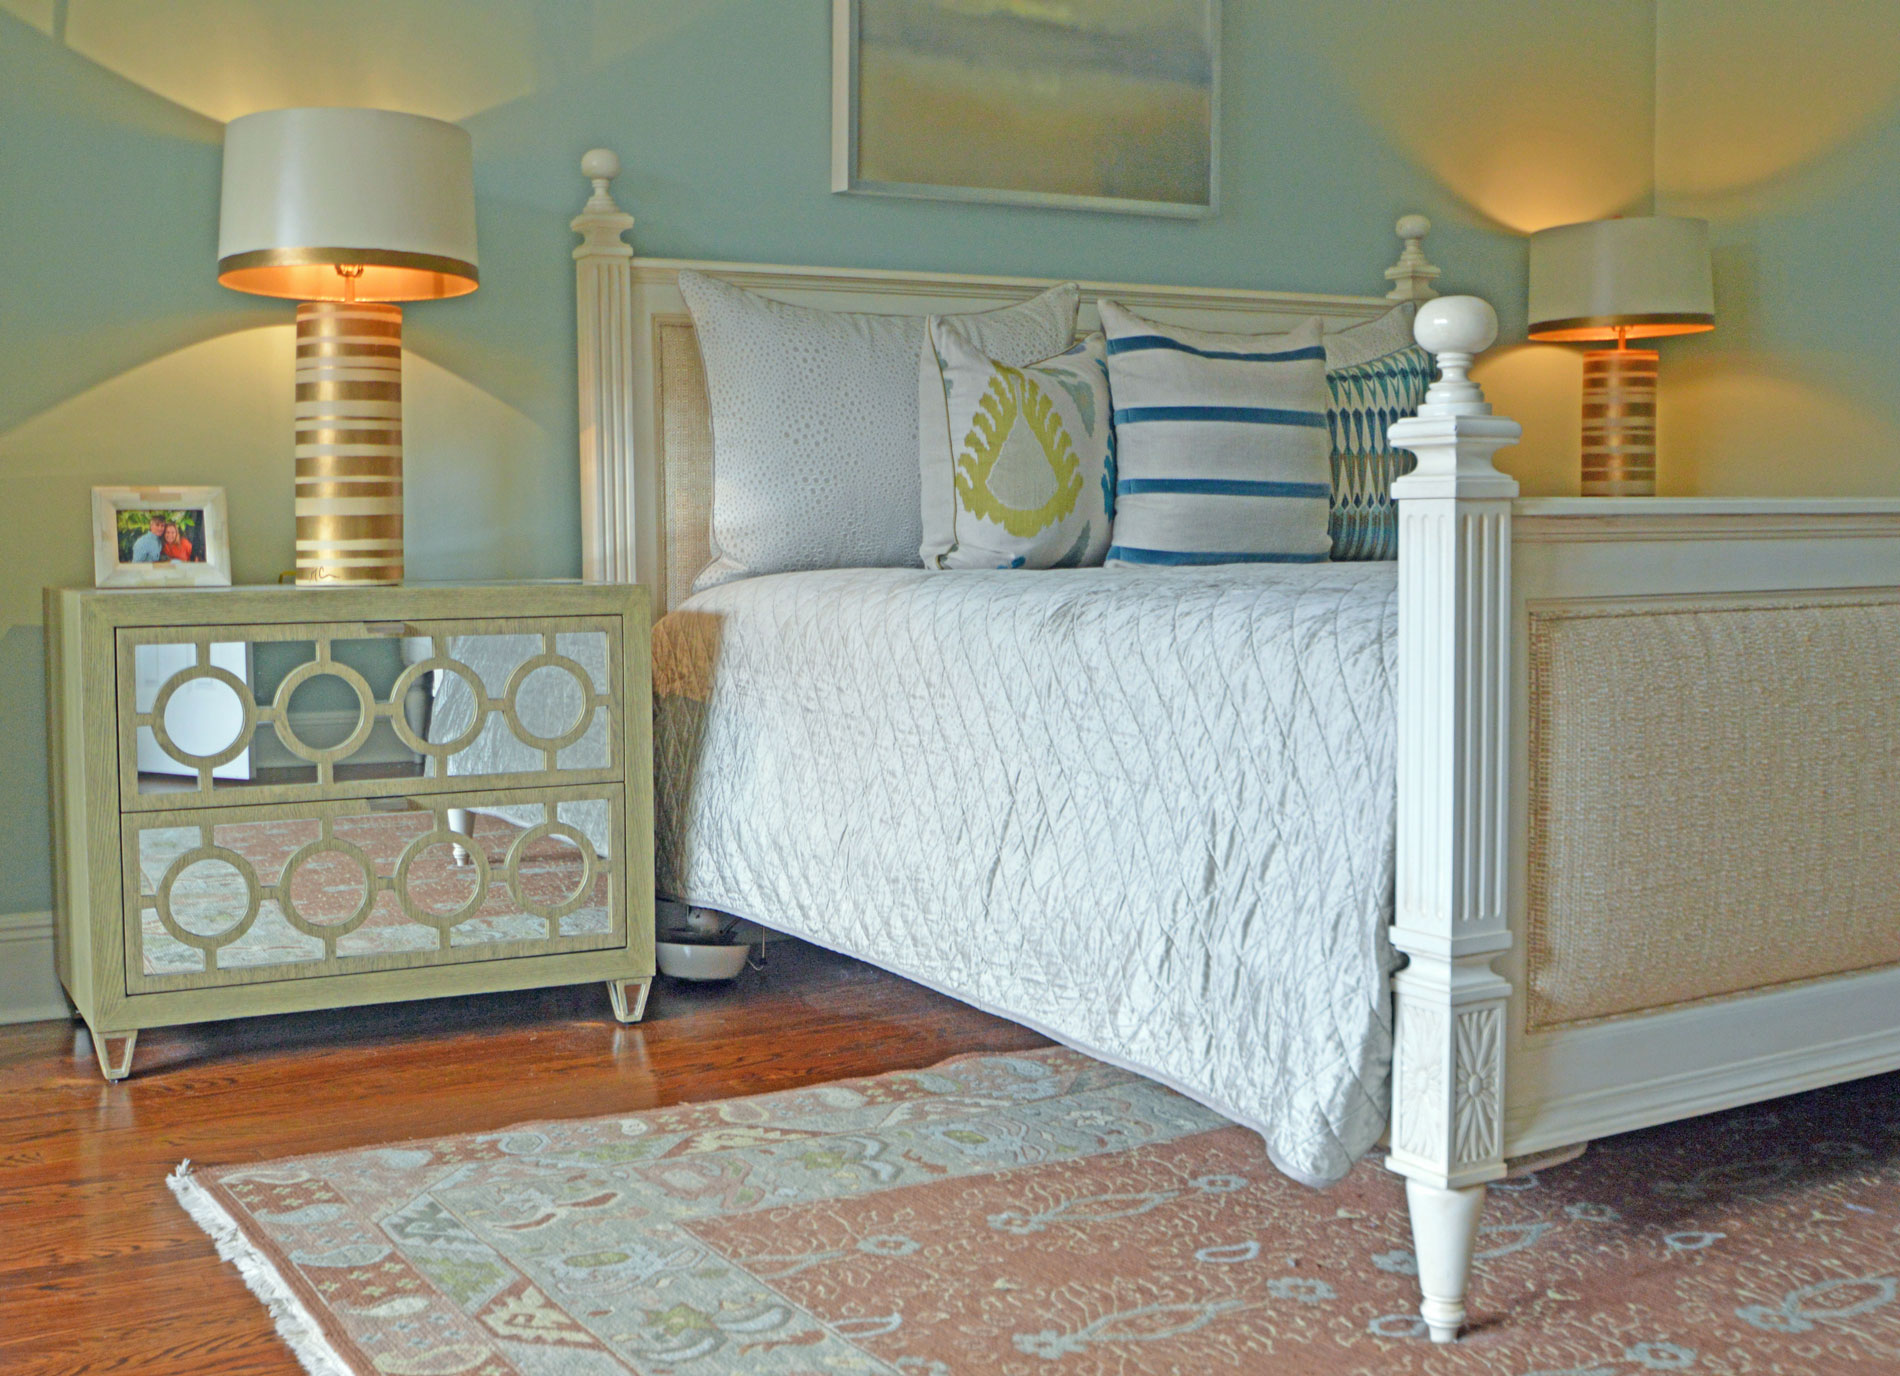 fawley-david2-dixon-smith-interiors-baton-rouge-interior-design-custom-furniture-web-0013